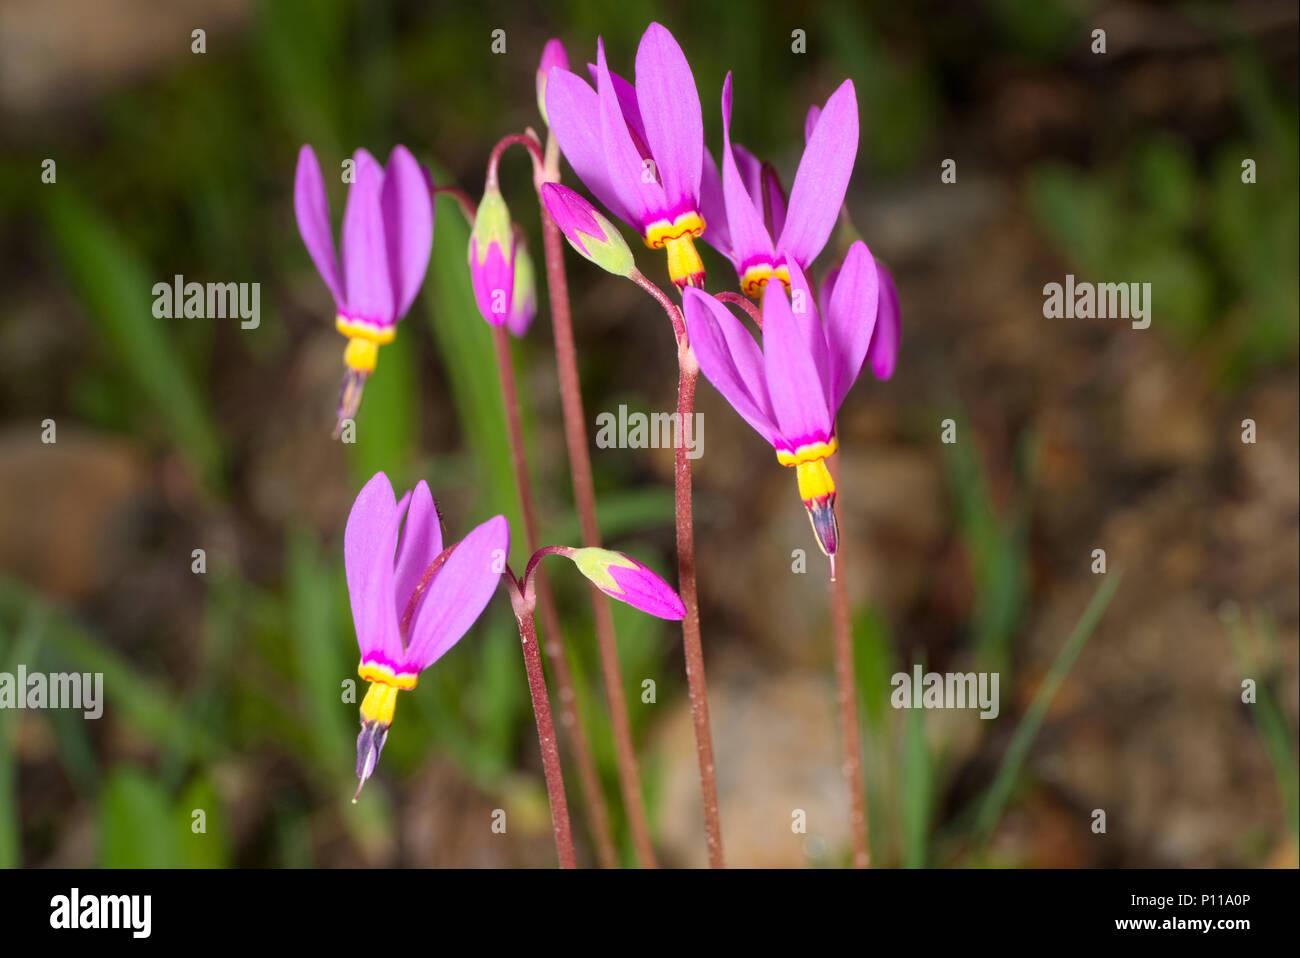 Dodecatheon pulchellum - Stock Image